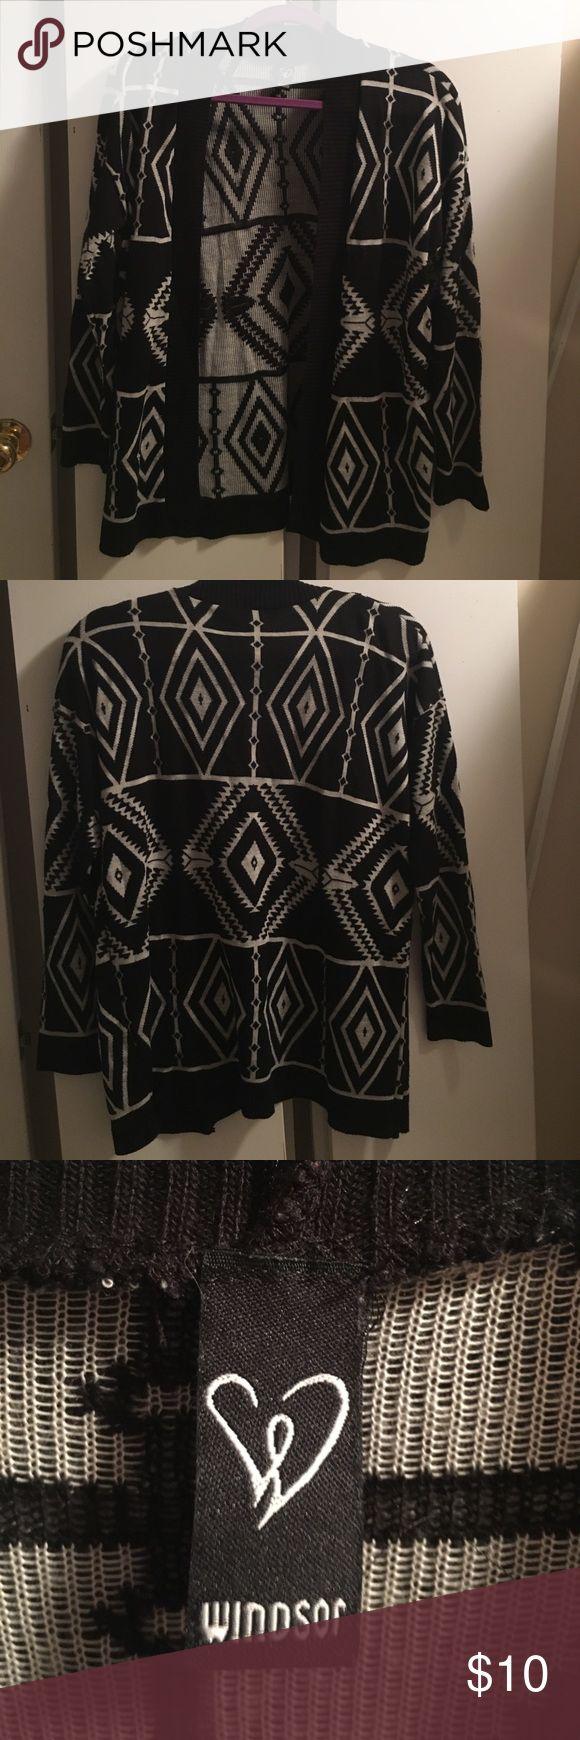 Windsor Black/Grey Aztec Print Cardigan Windsor black and grey Aztec print cardigan. Size small. WINDSOR Sweaters Cardigans